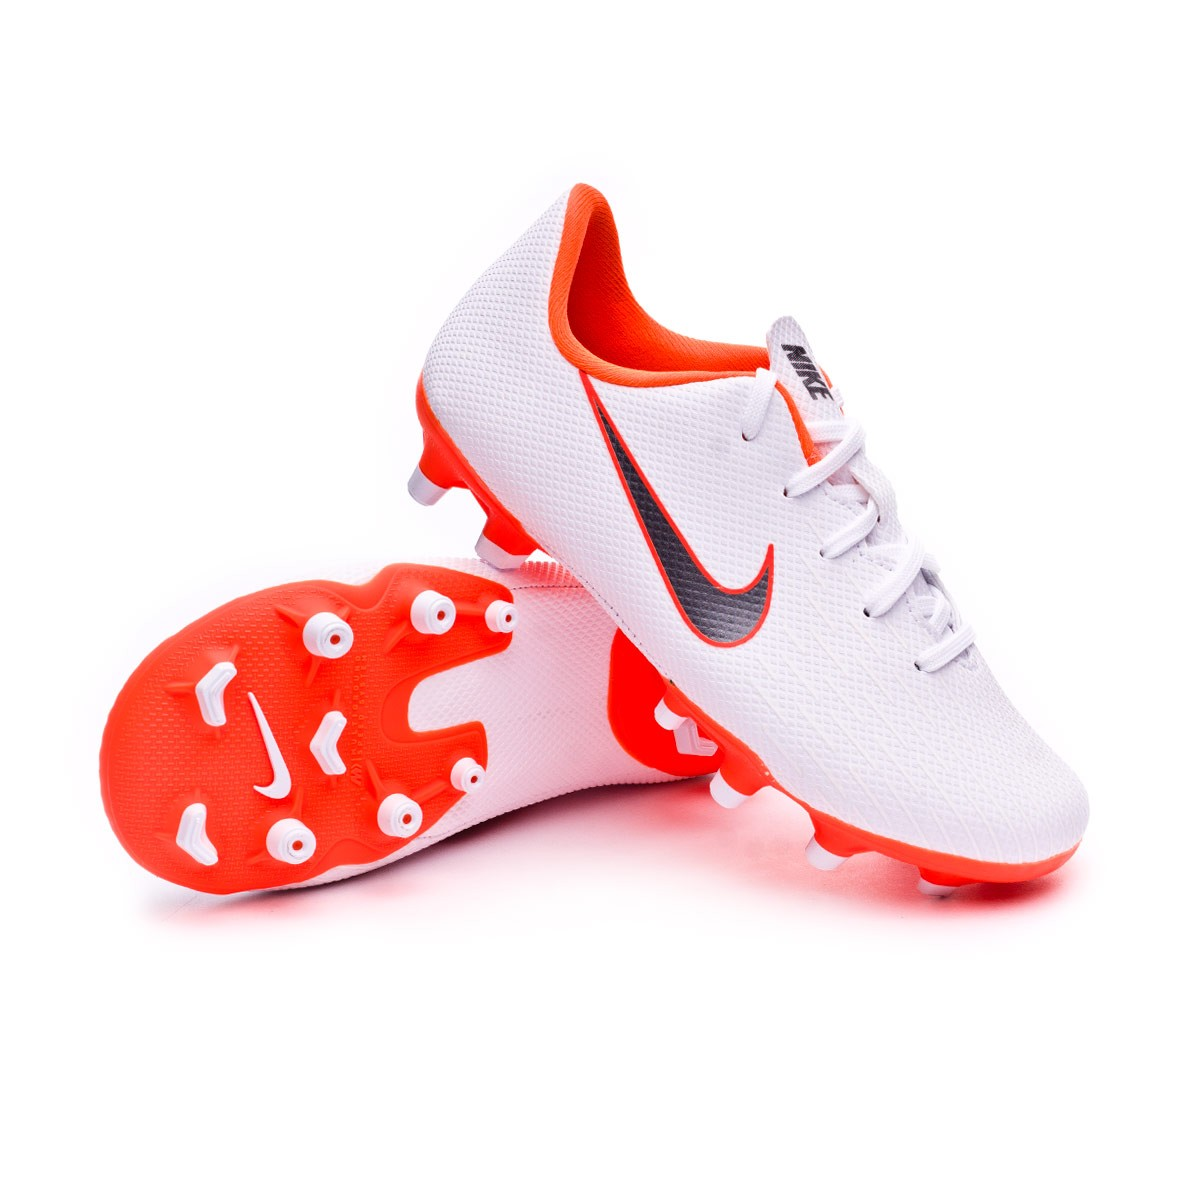 a1a5a95d7bee Football Boots Nike Mercurial Vapor XII Academy PS MG White-Metallic ...